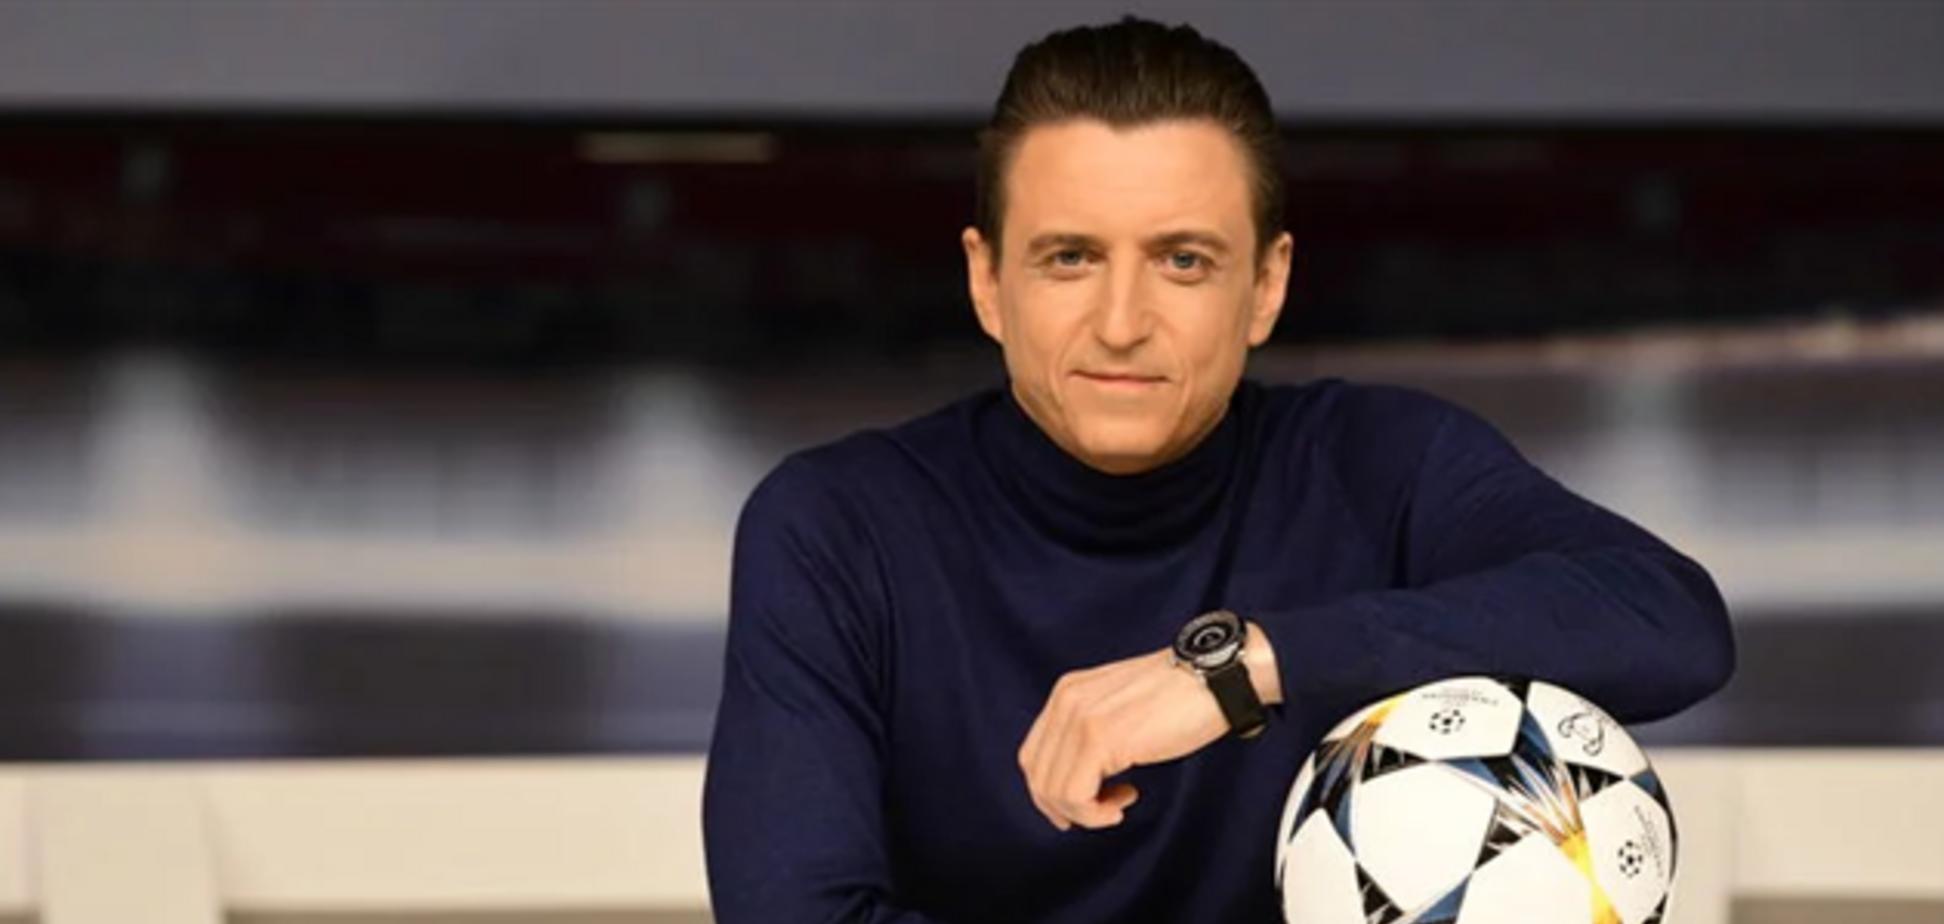 'Стоїть під горлом': ведучий 'Великого футболу' Олександр Денисов заявив про плани перейти на українську мову